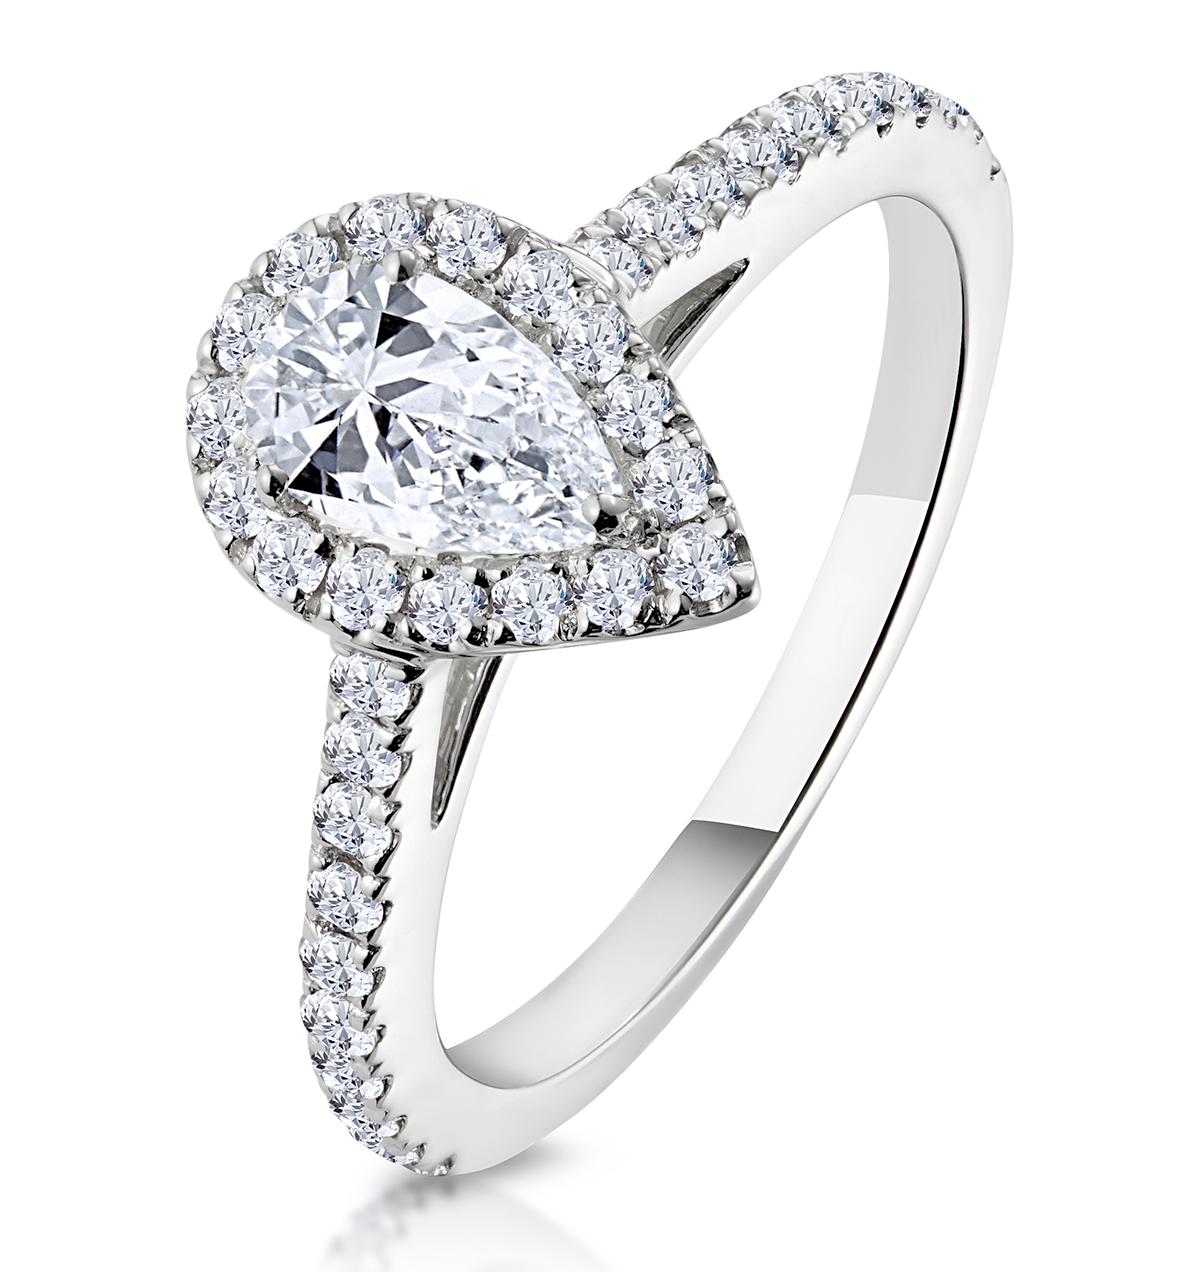 Diana GIA Diamond Pear Halo Engagement Ring Platinum 1ct G/VS2 - image 1